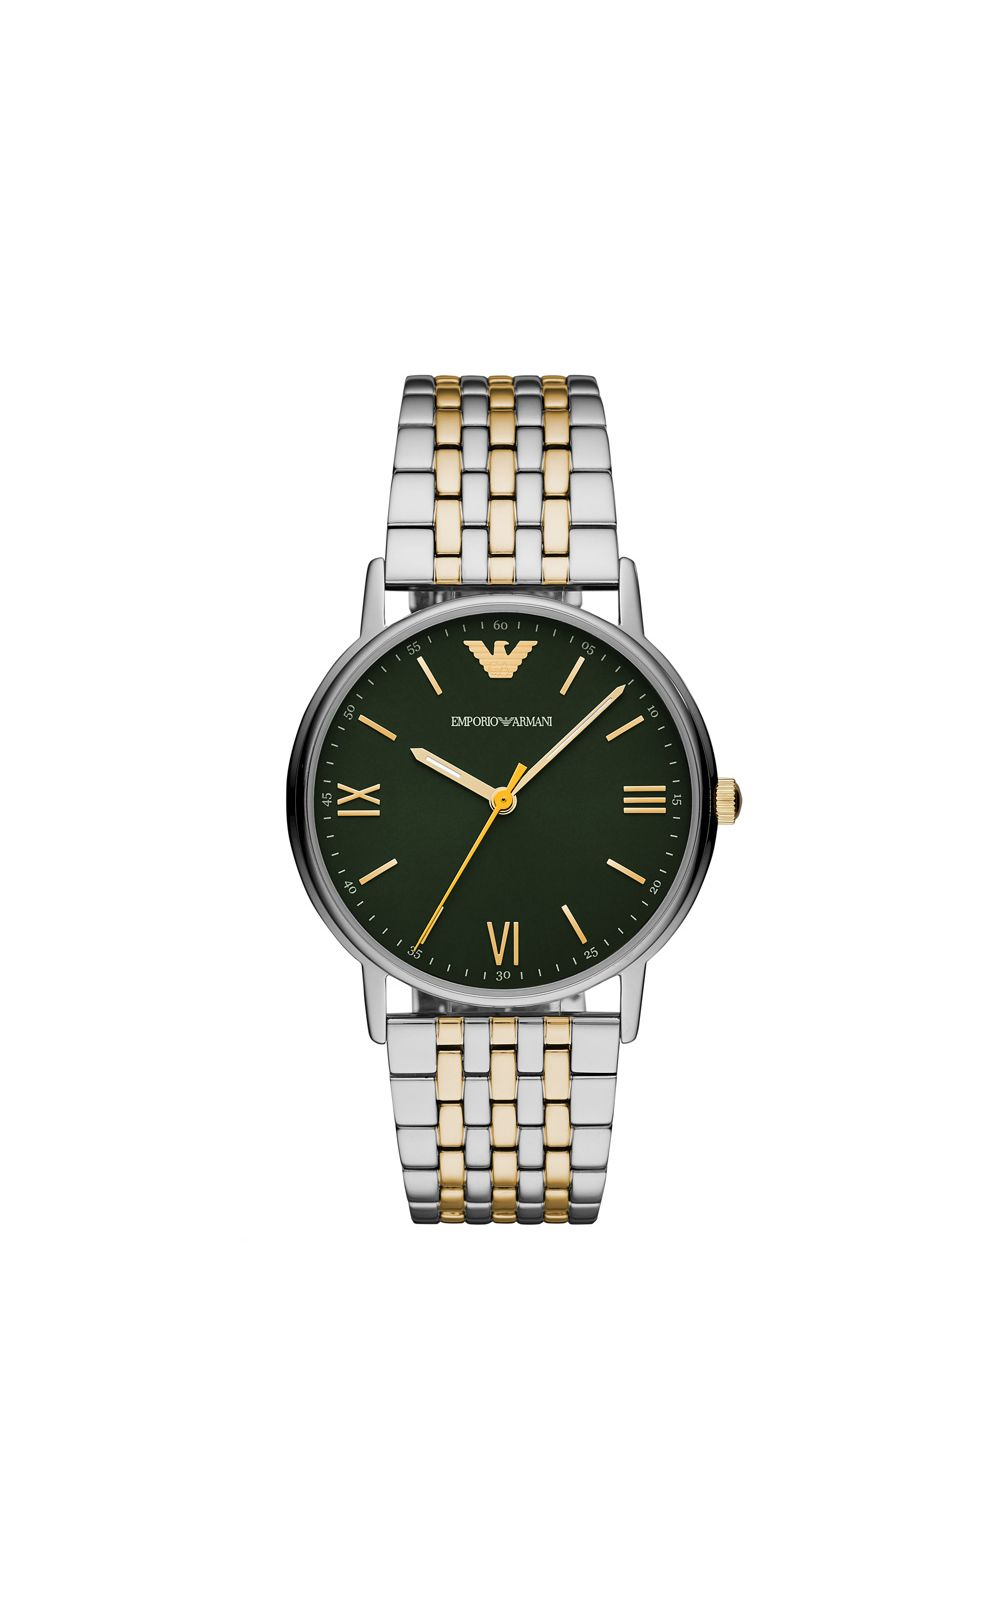 Foto 1 - Relógio Emporio Armani Kappa Masculino Prata AR11228/1KN